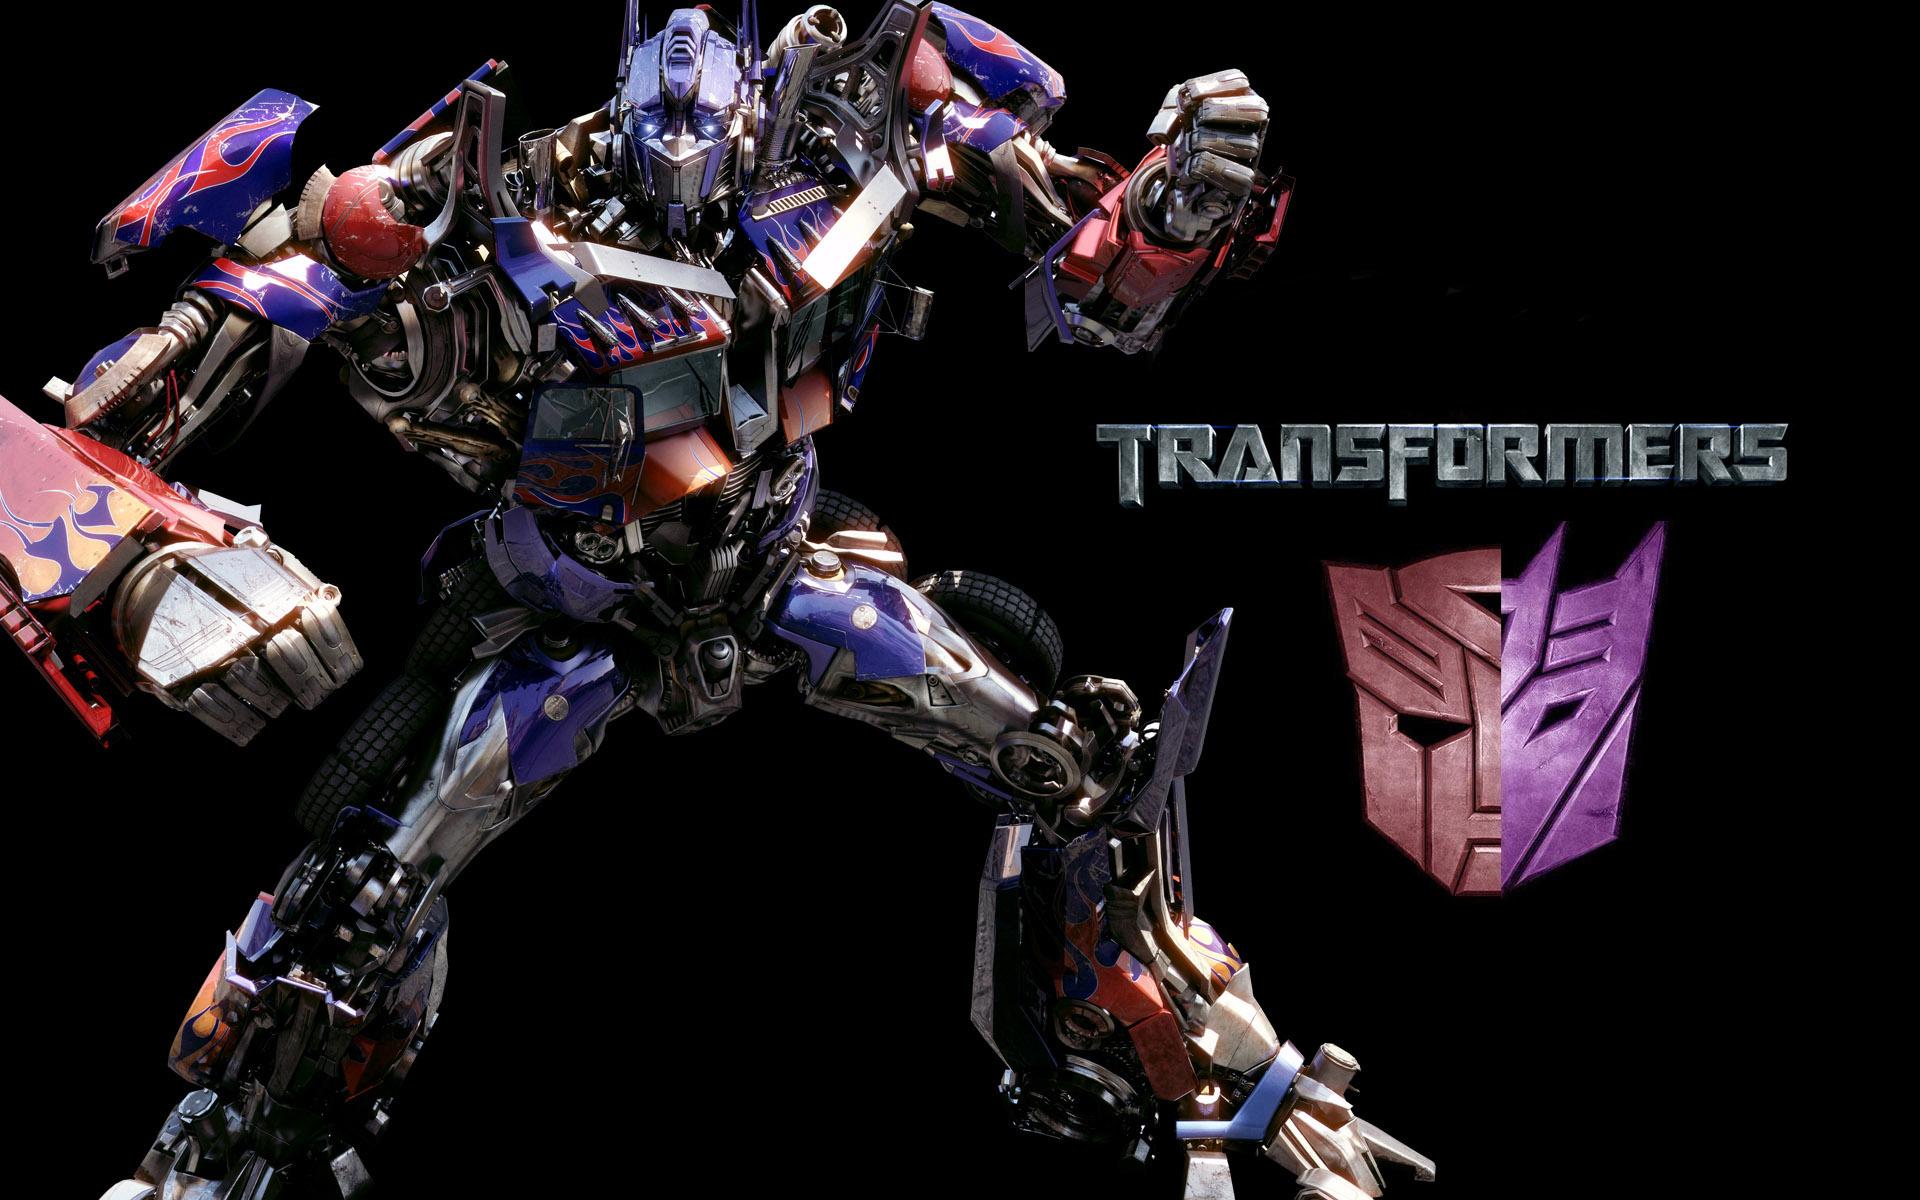 Transformers 25134   99Wallpaper 1920x1200